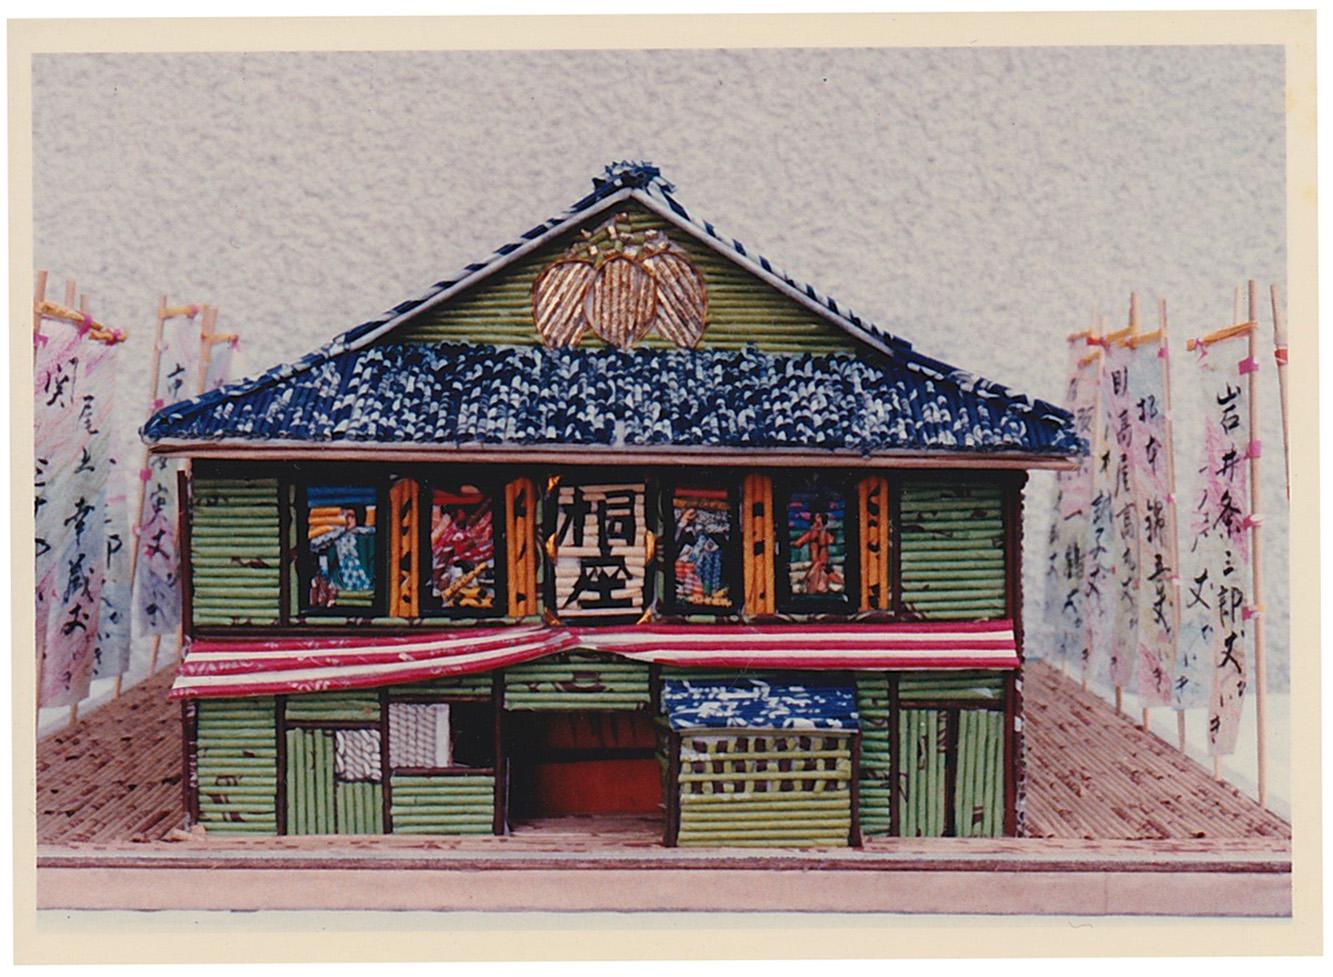 (cap)こより絵で復元された「小田原桐座」津田久紫翁作。 Photo:石井富之助